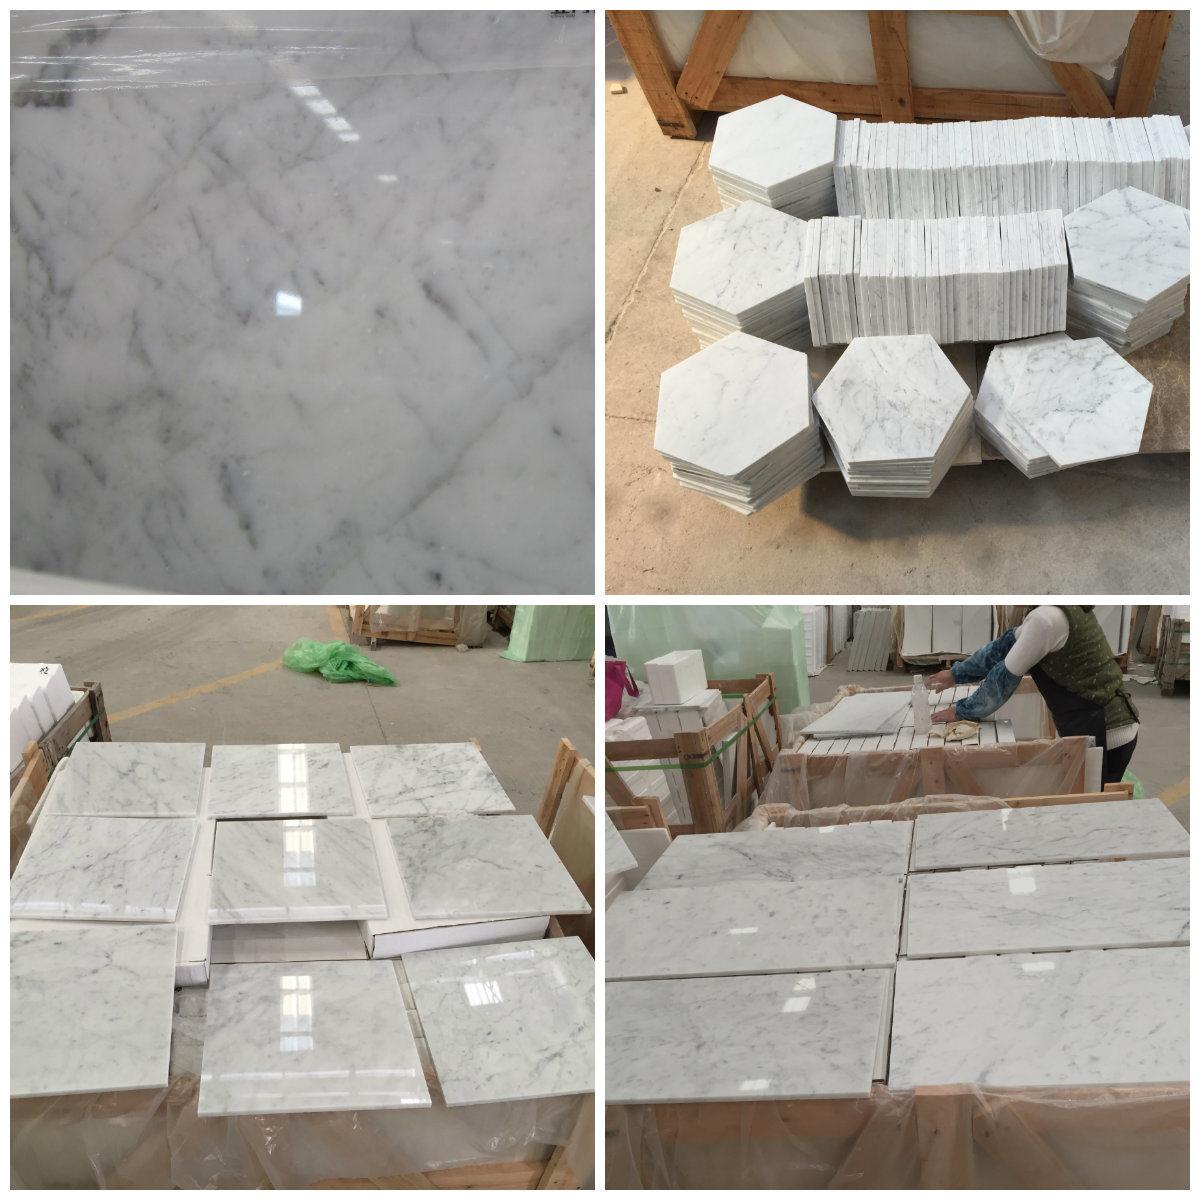 China Bianco Carrara Statuario White Marble for Laminate Flooring Stone  Tiles - China Cheap Price Tiles, Discount Marble Tiles